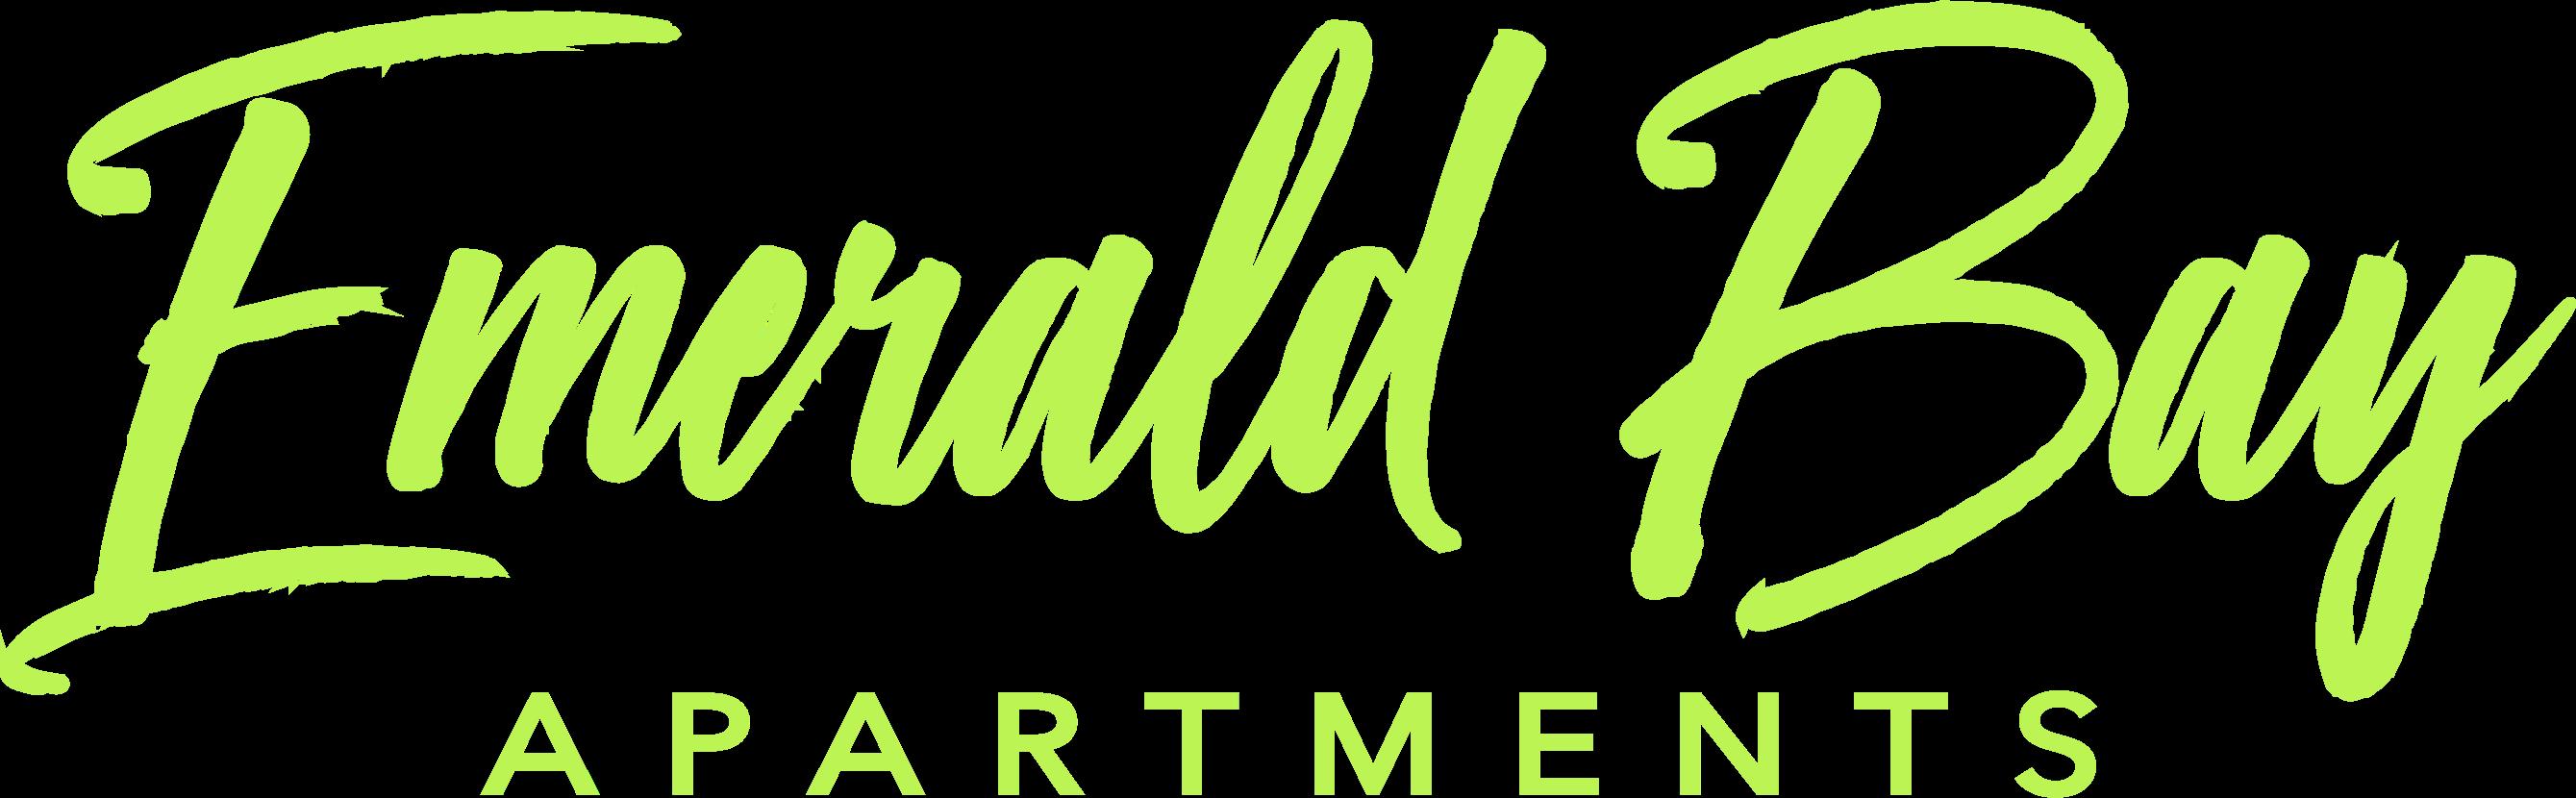 Charlotte Property Logo 13